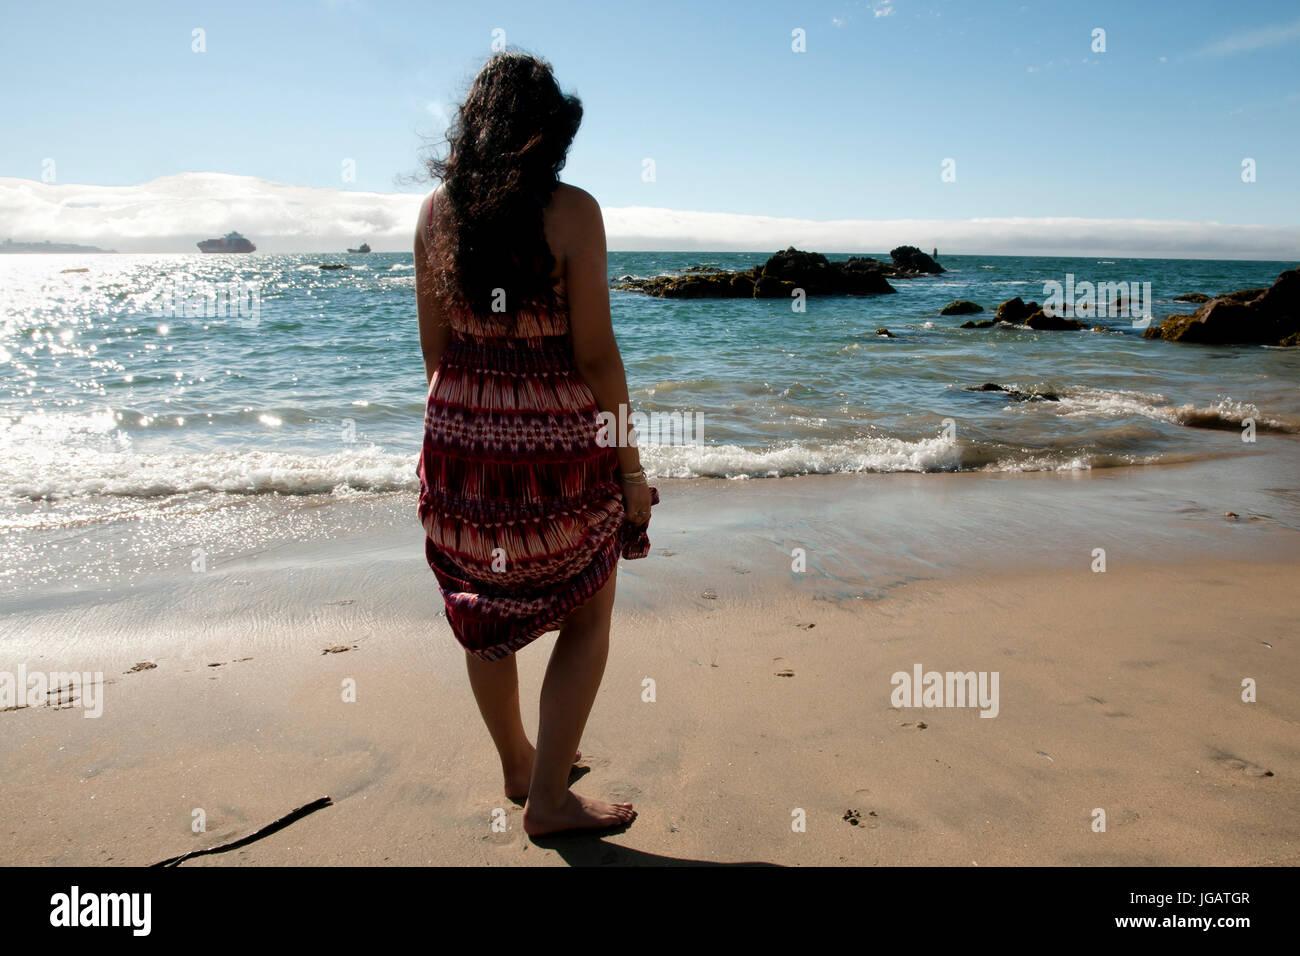 Caleta Abarca Beach - Vina Del Mar - Chile - Stock Image